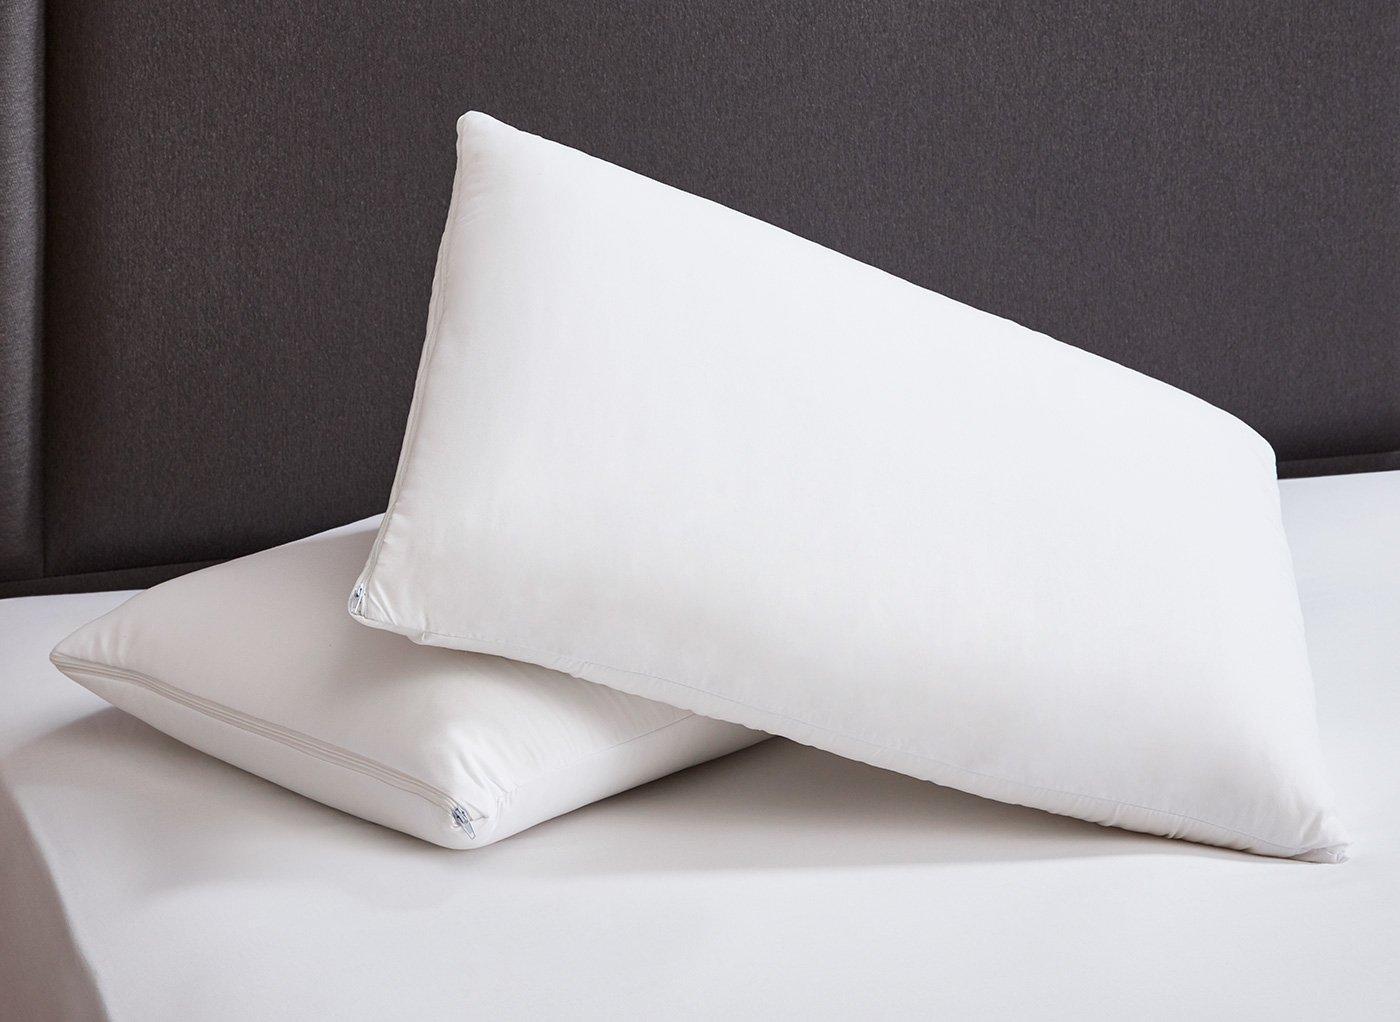 Doze Memory Foam Pillow